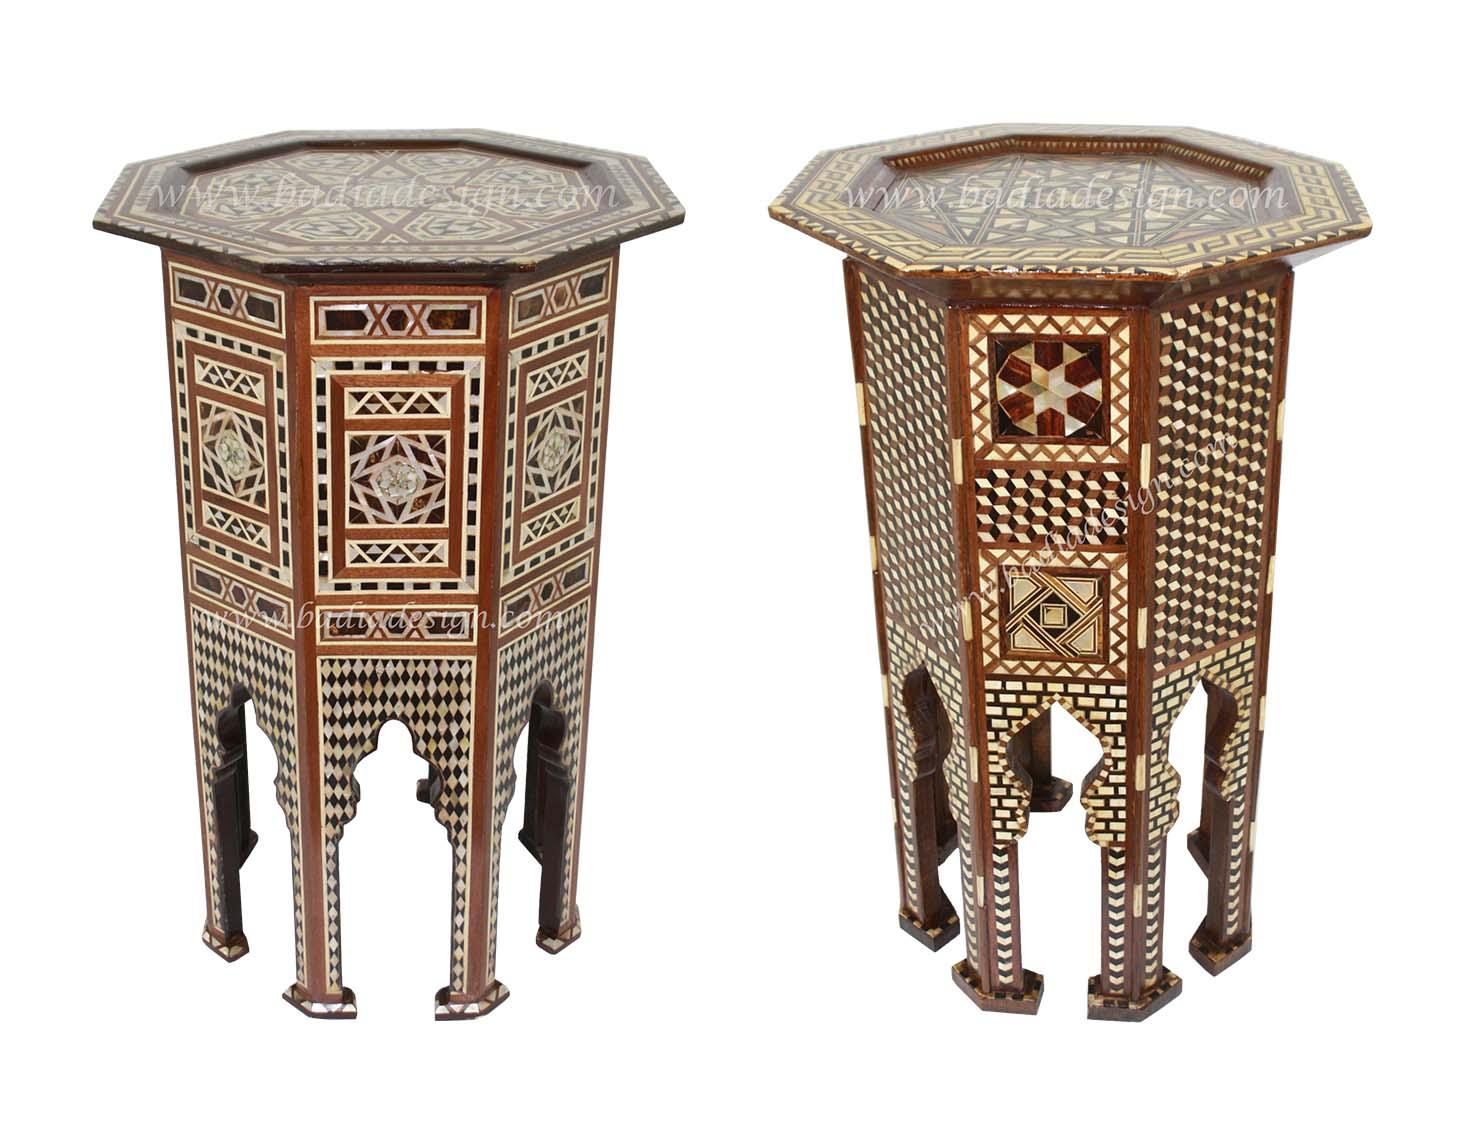 syrian-furniture-los-angeles-mop-st077.jpg